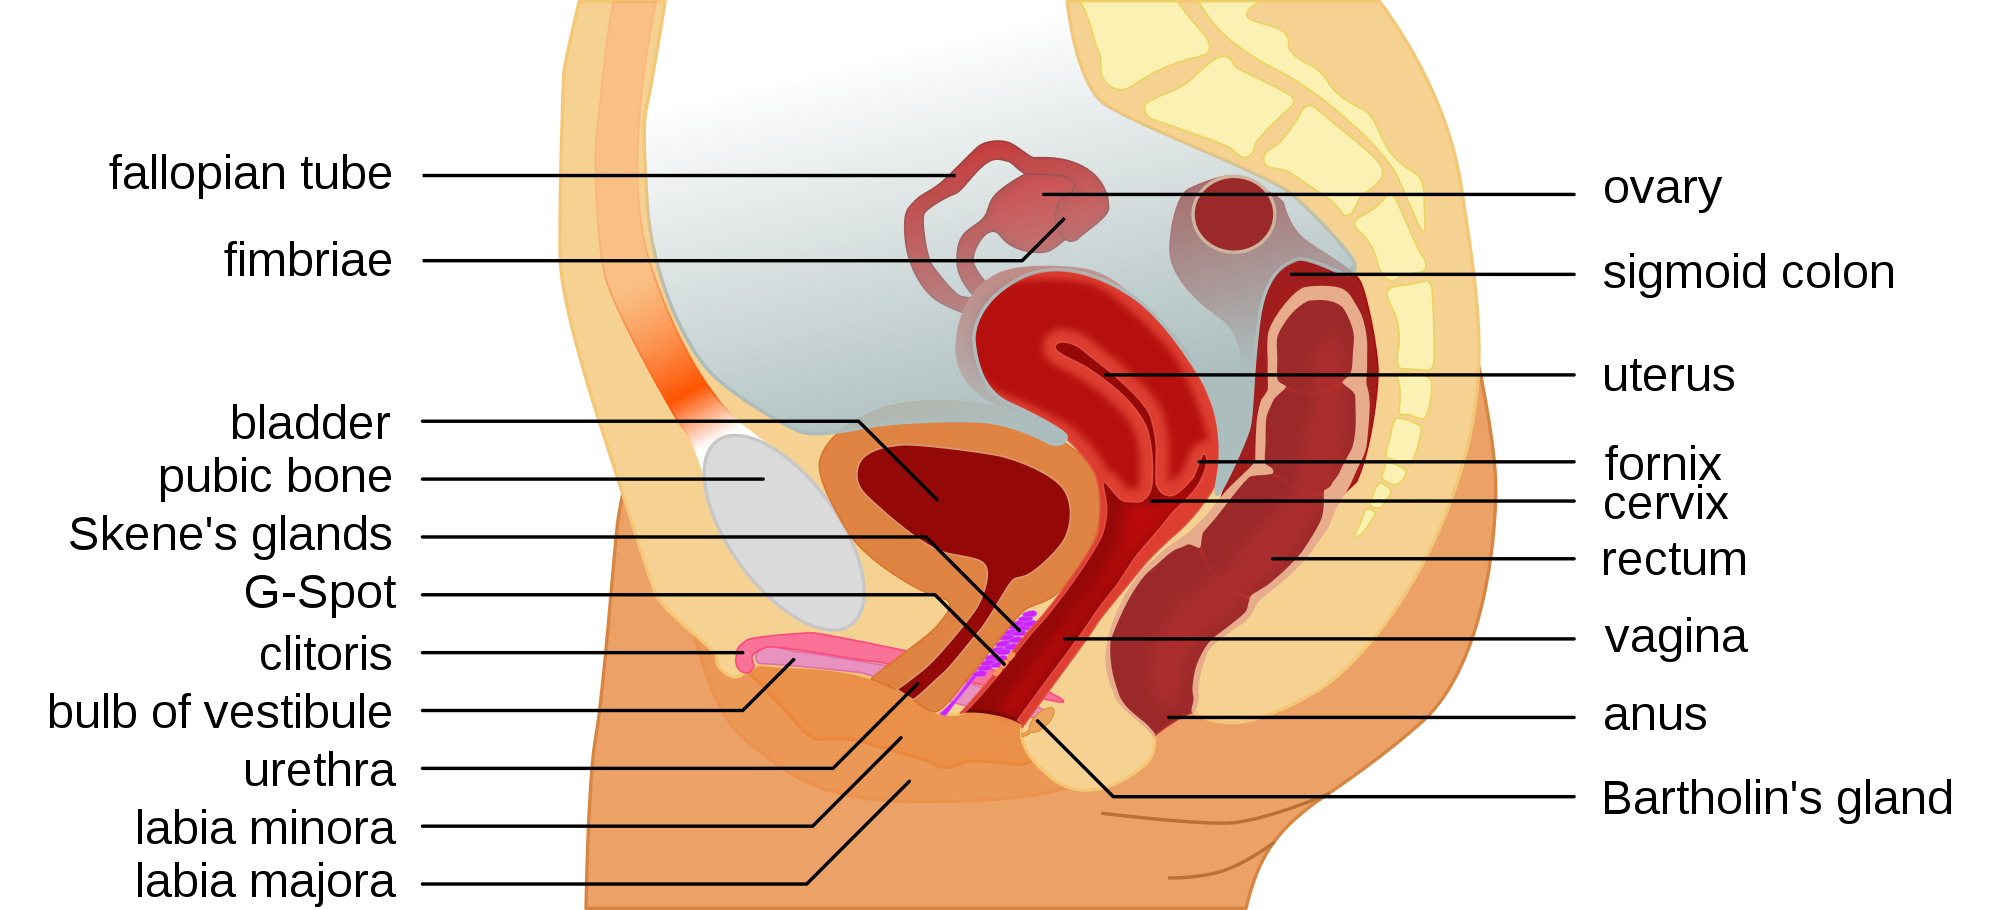 G spot diagram